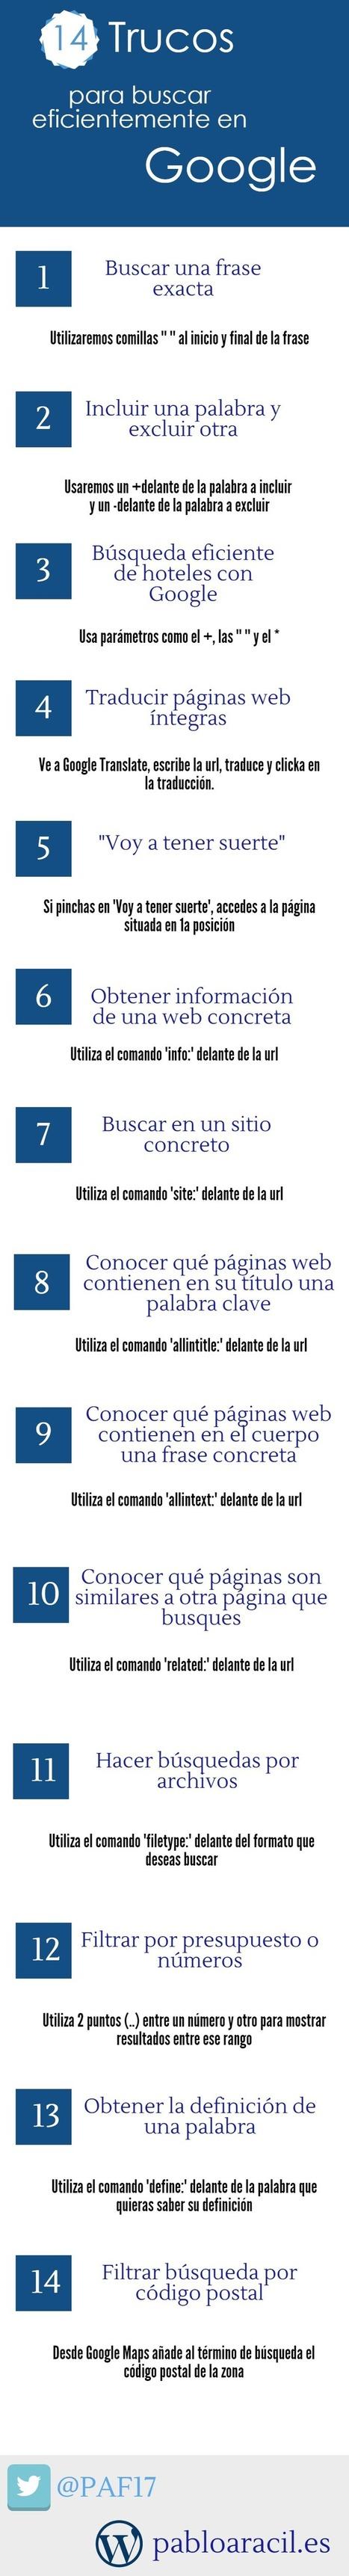 14 trucos pra buscar eficientemente en Google #infografia #infographic | Moodle en Latinoamérica | Scoop.it